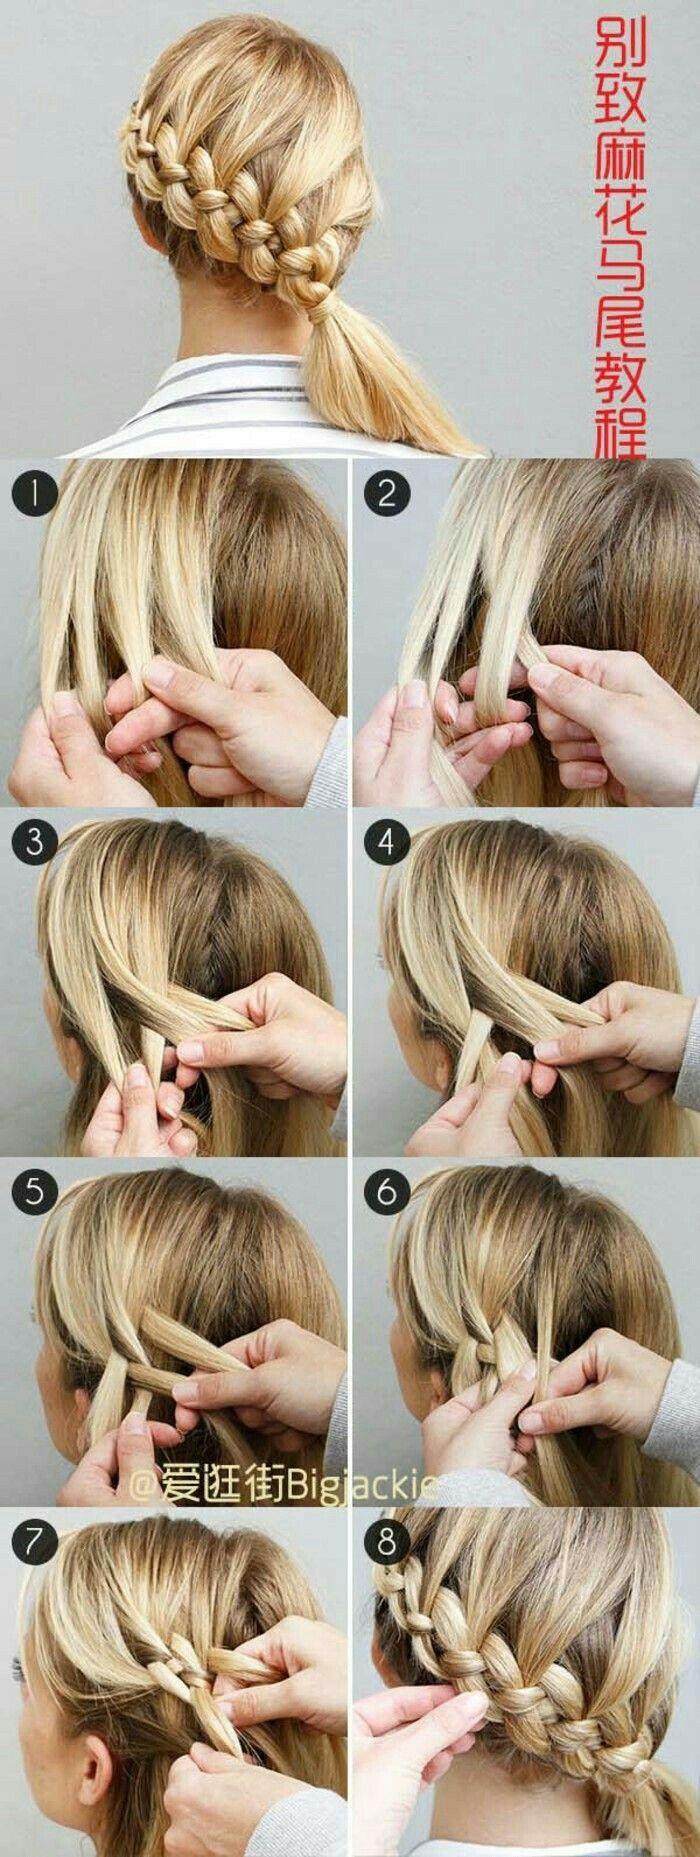 Frenchdutch four stranded braid hairstyles for emma in